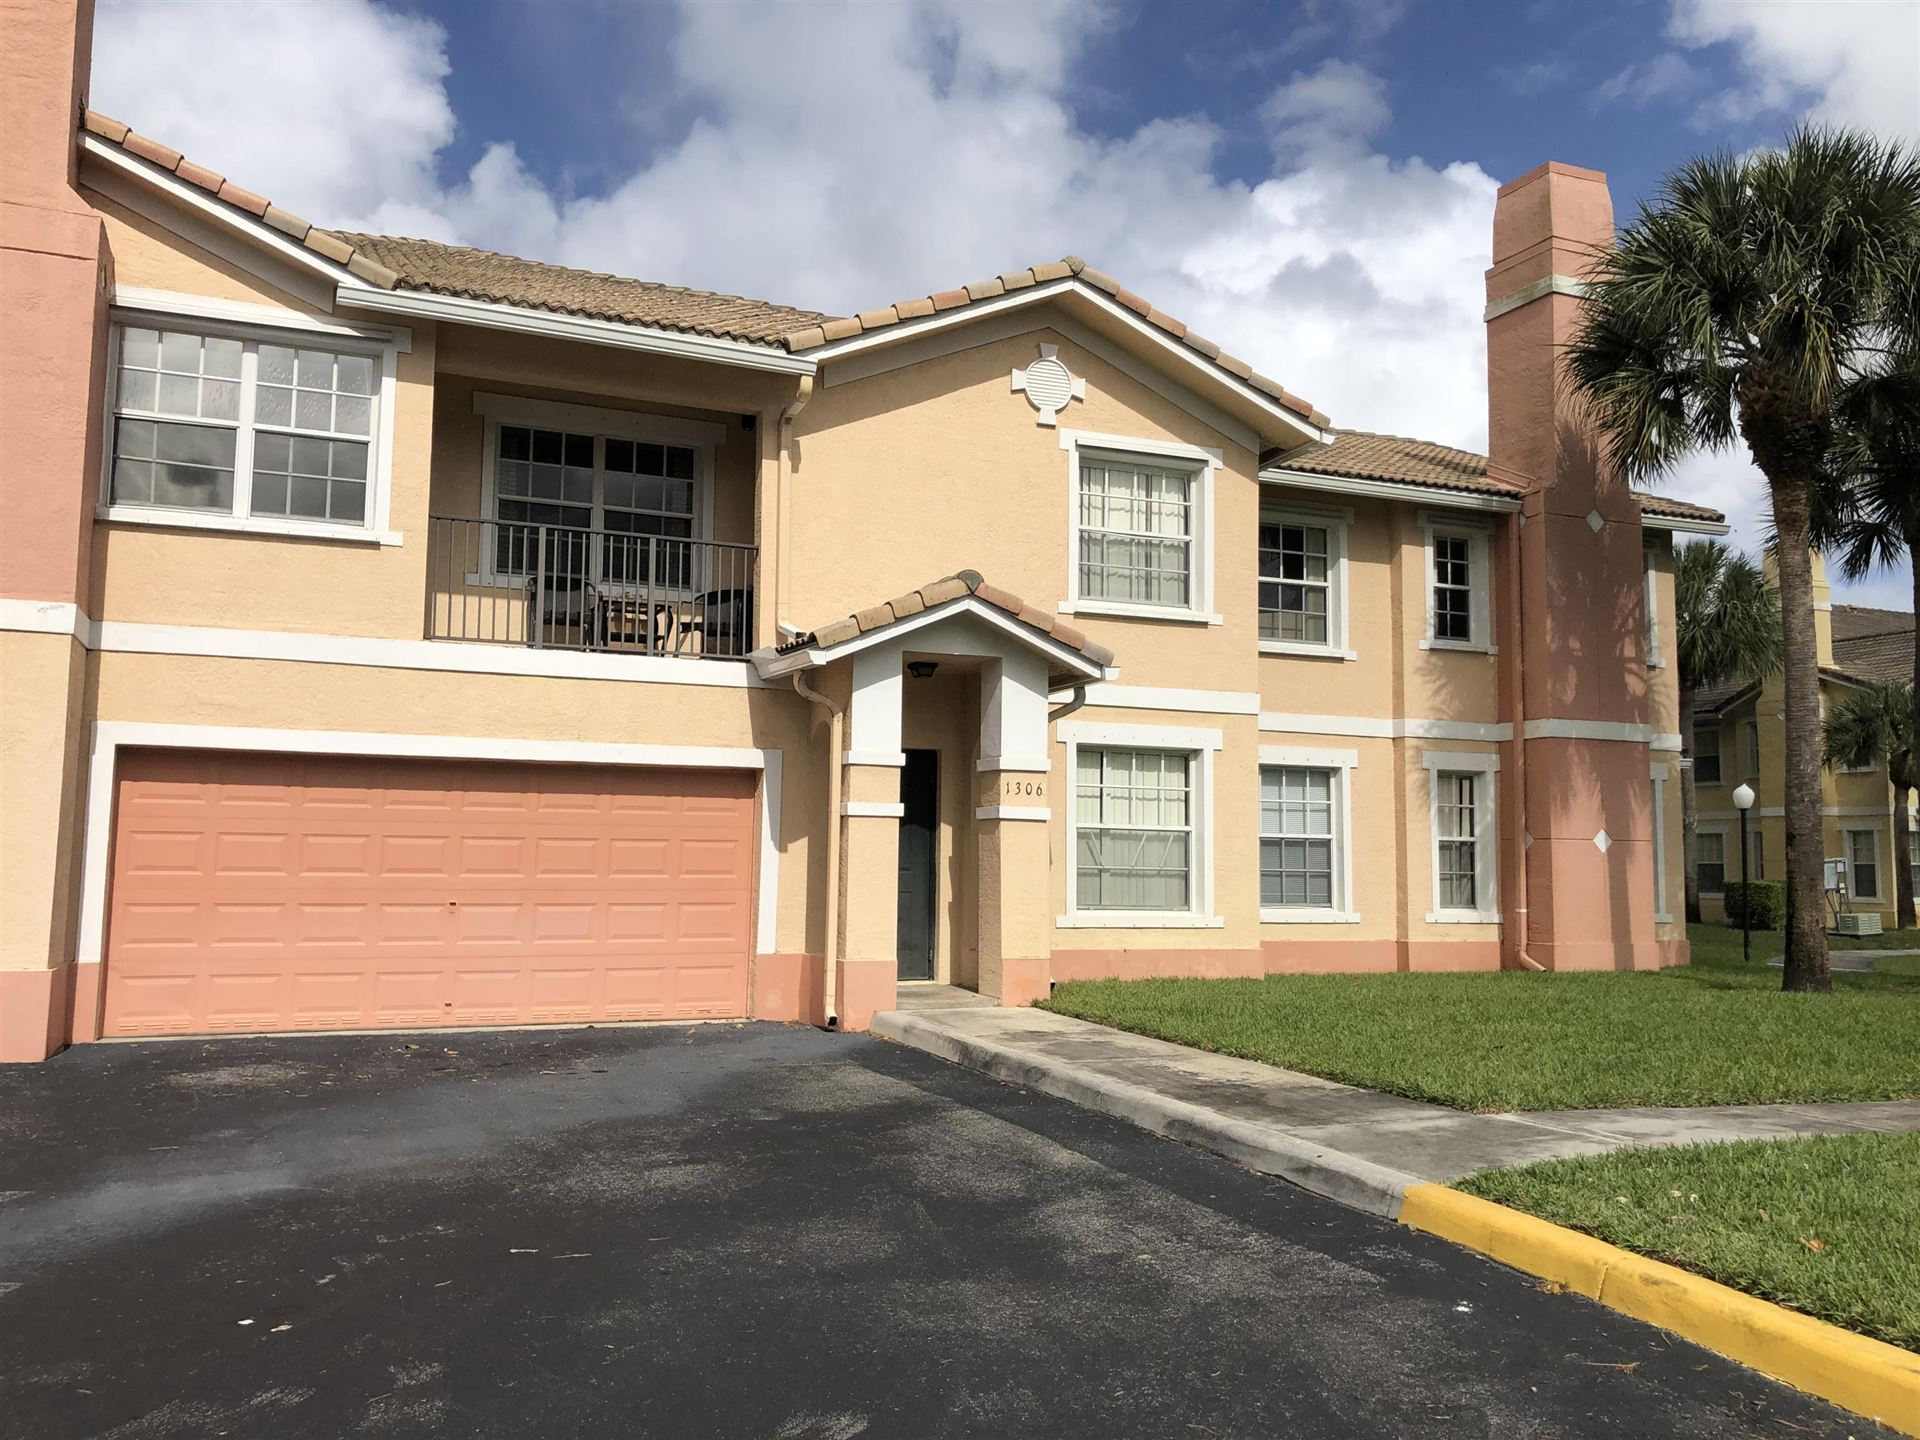 1306 Belmont Lane, North Lauderdale, FL 33068 - #: RX-10596596